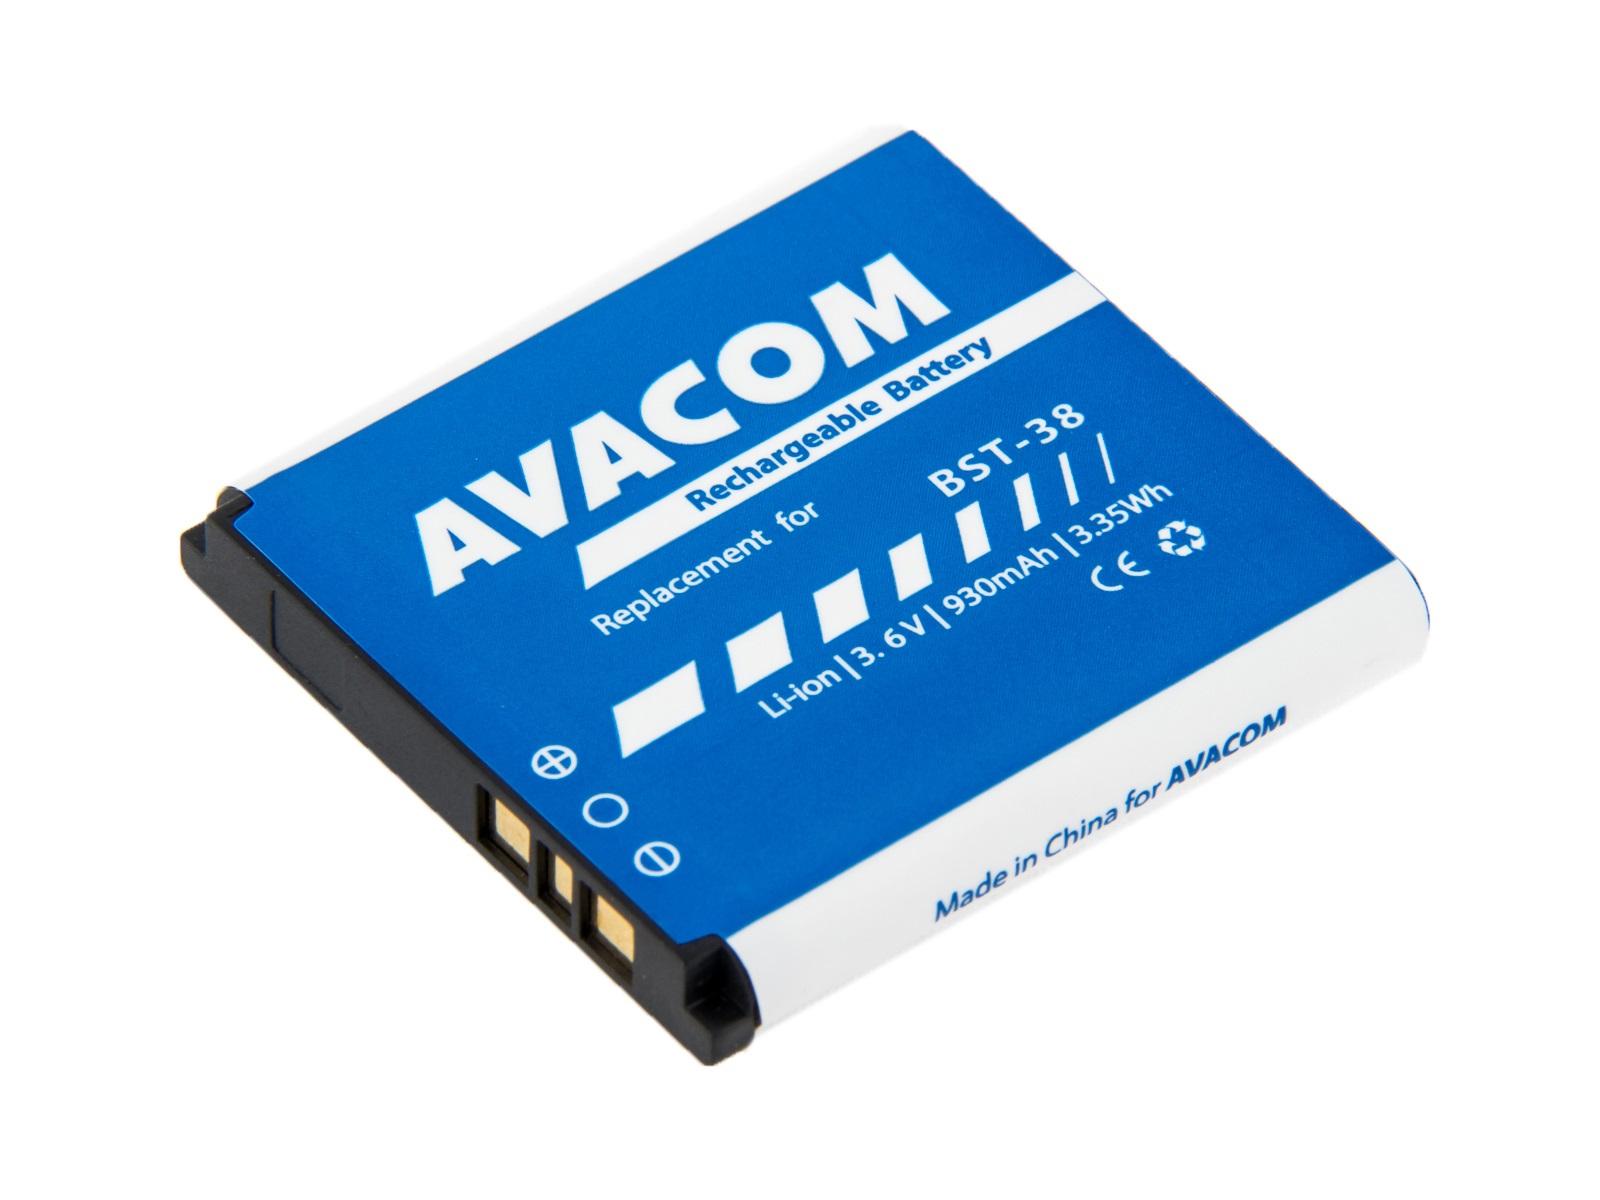 Baterie AVACOM do mobilu Sony Ericsson S510i, K770  Li-Ion 3,6V 930mAh (náhrada BST-38)